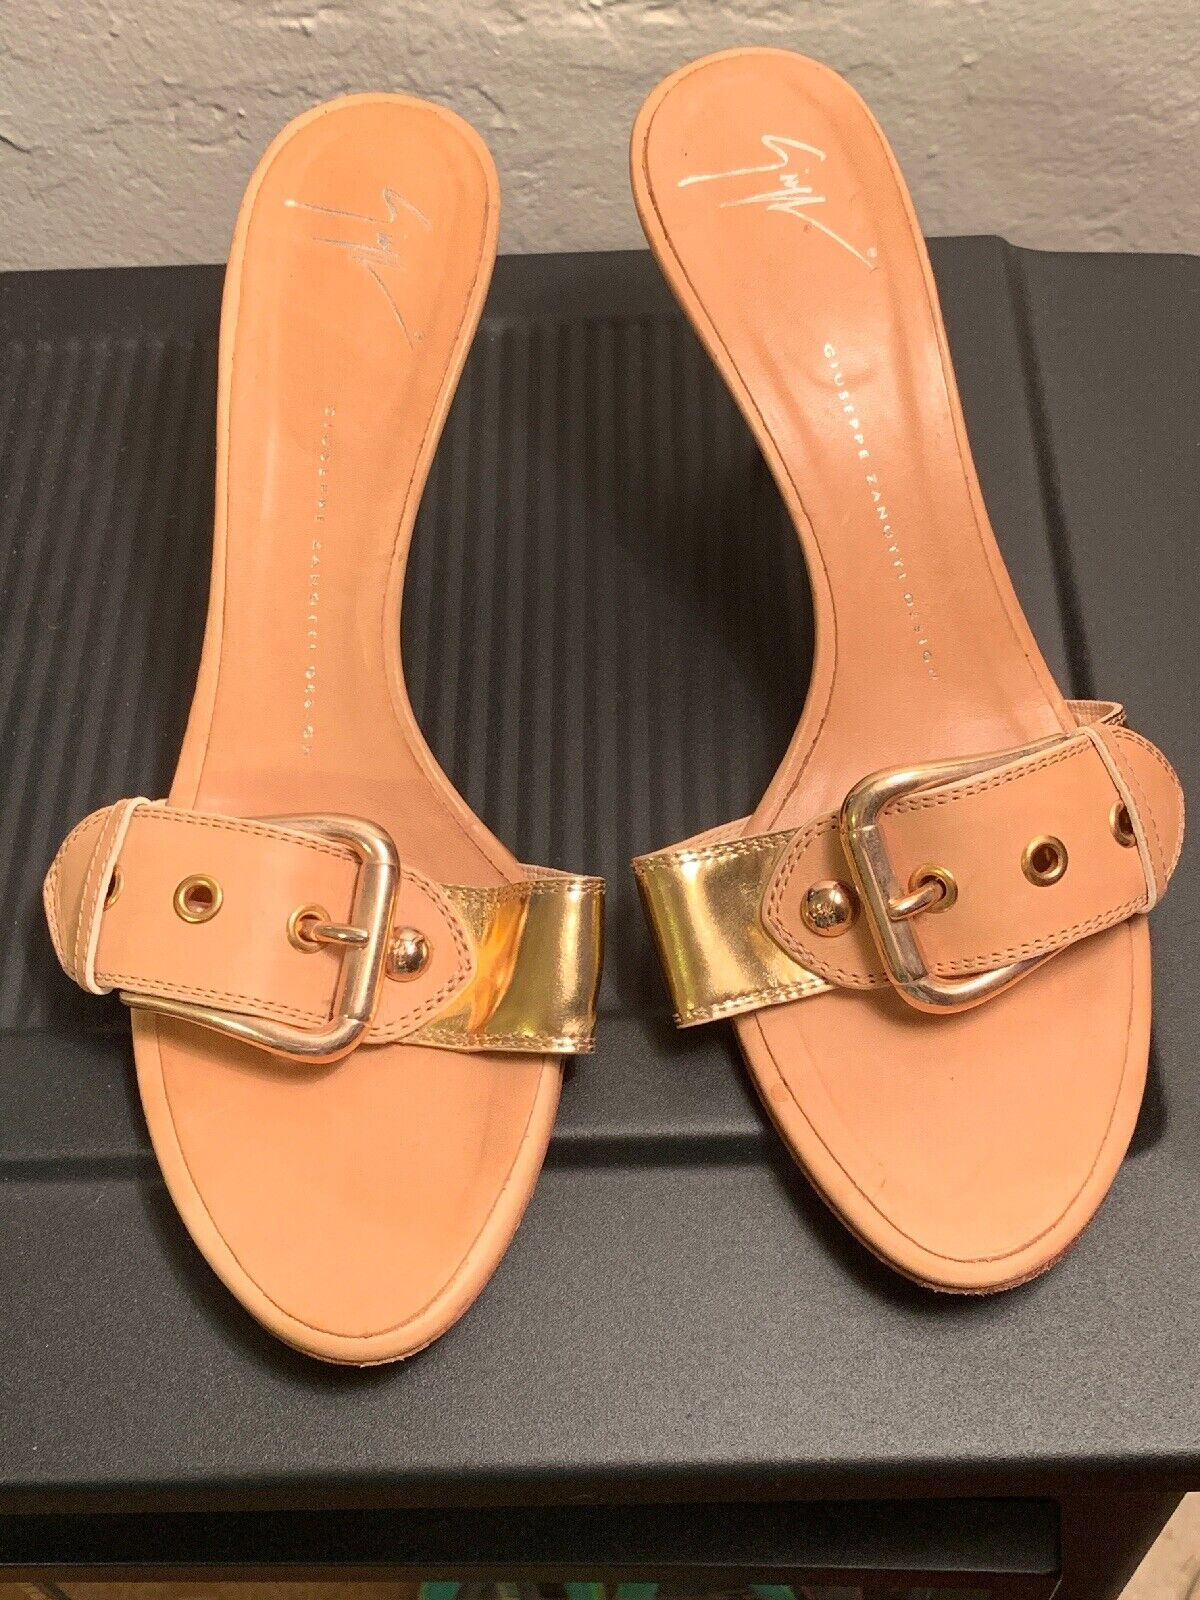 Guiseppe zanotti Tan & gold Leather Buckle Mules Slides Sandals EU Sz 40 US Sz 9